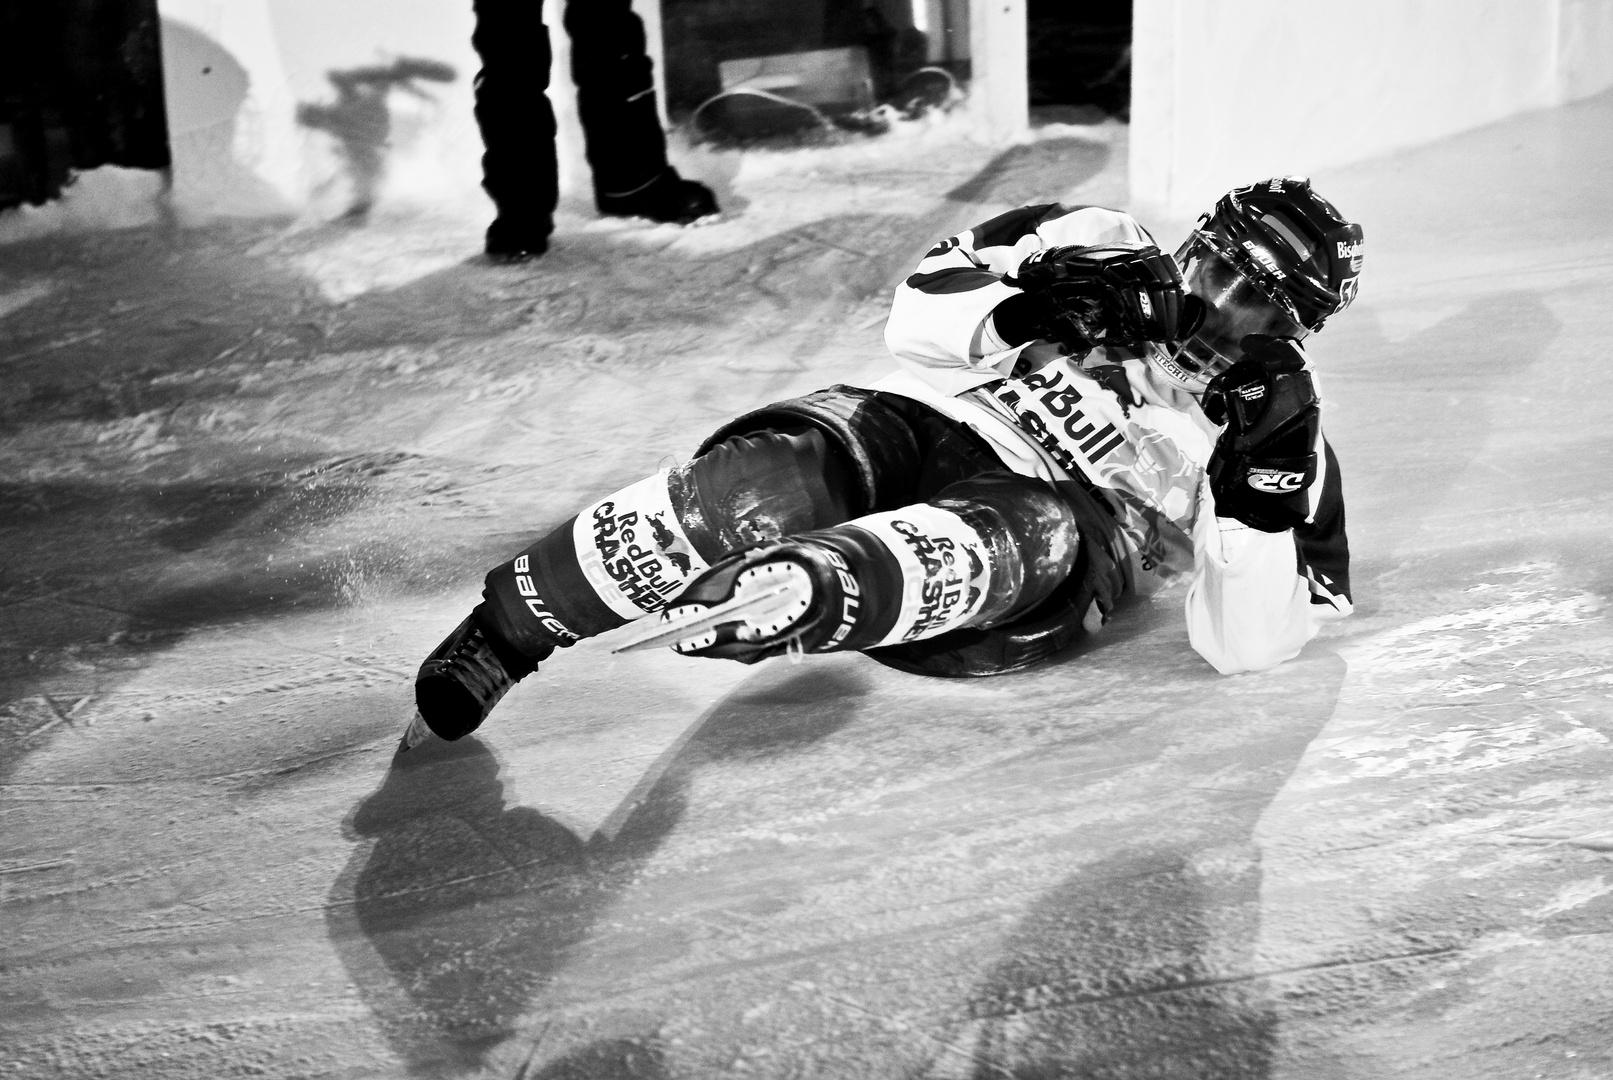 Red Bull Crashed Ice I - gelernt, wie man Bremst